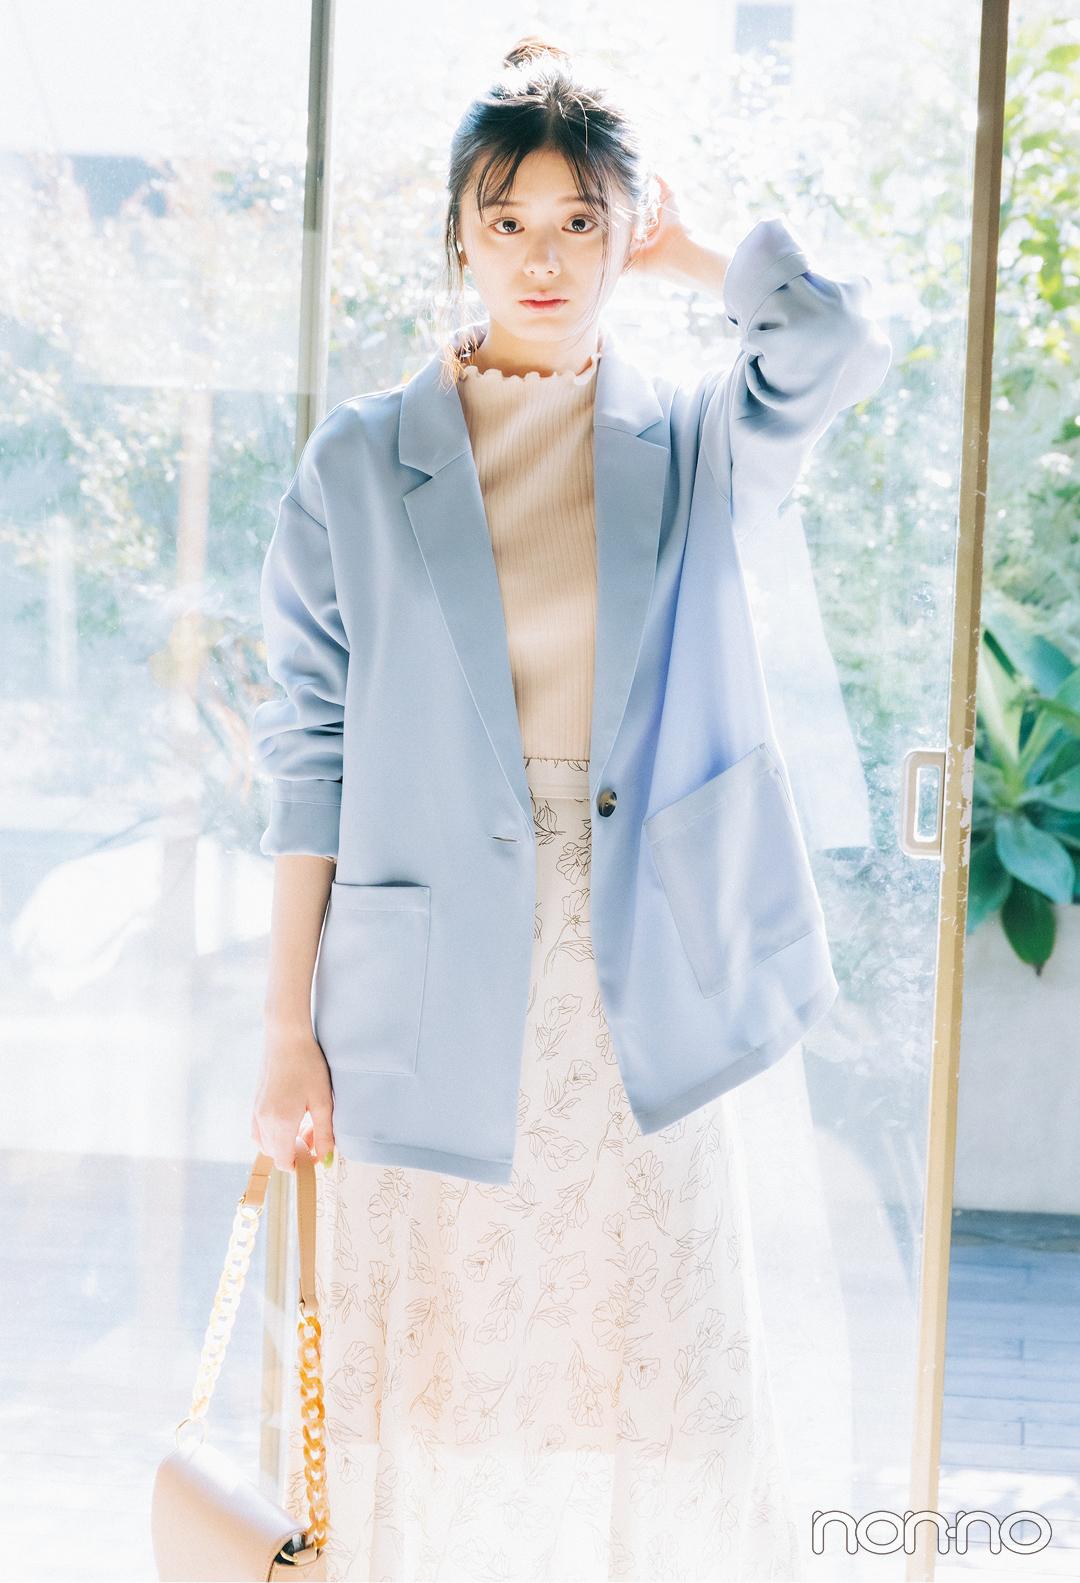 Photo Gallery モデル&女優として活躍中! 無限の透明感を持つ、紺野彩夏フォトギャラリー_1_3